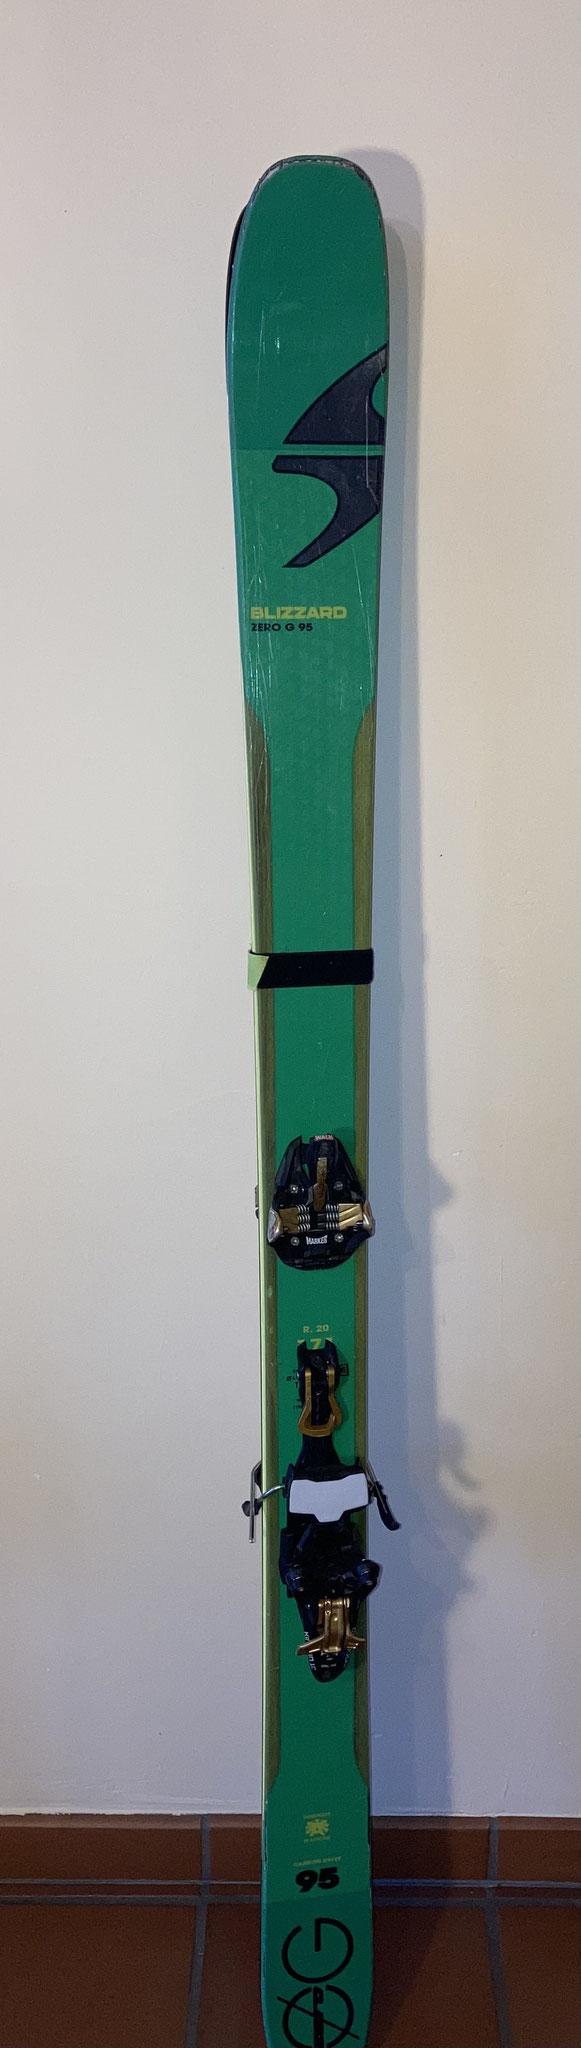 Blizzard Zero G95, Länge 171cm, Waist 95mm, Bindung Marker Kingpin